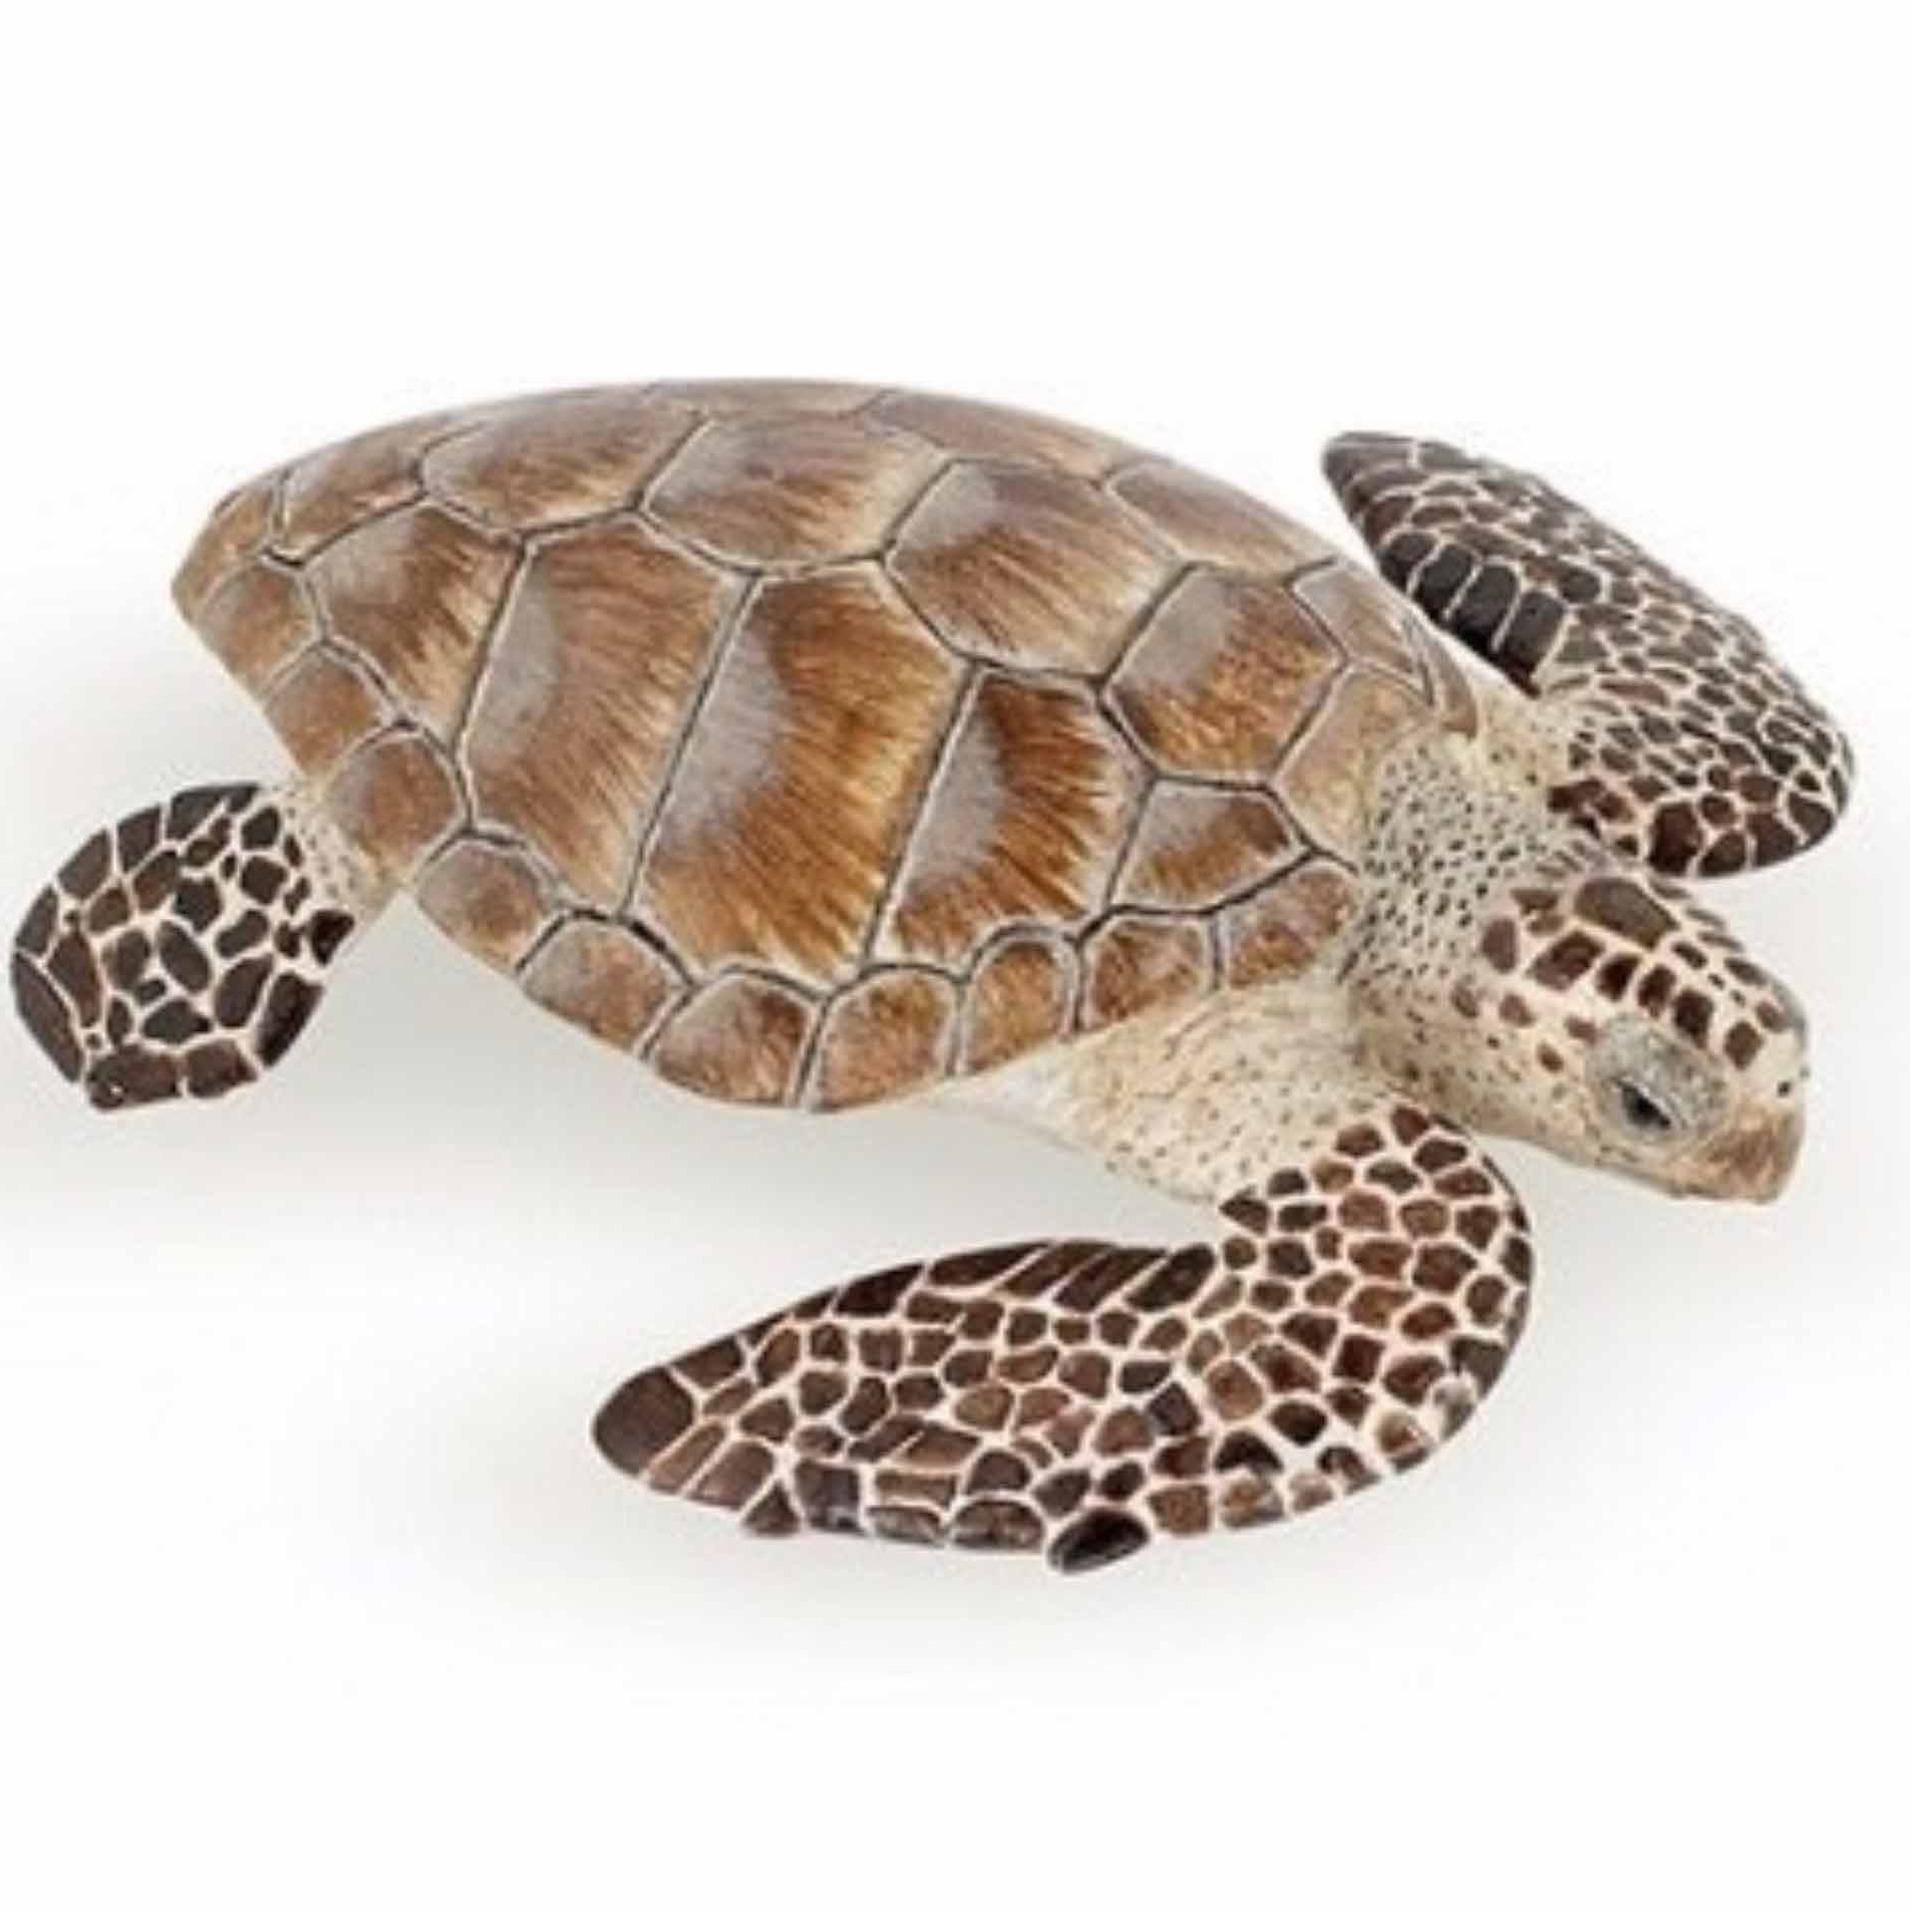 Plastic karetschildpad speeldiertje 7,5 cm